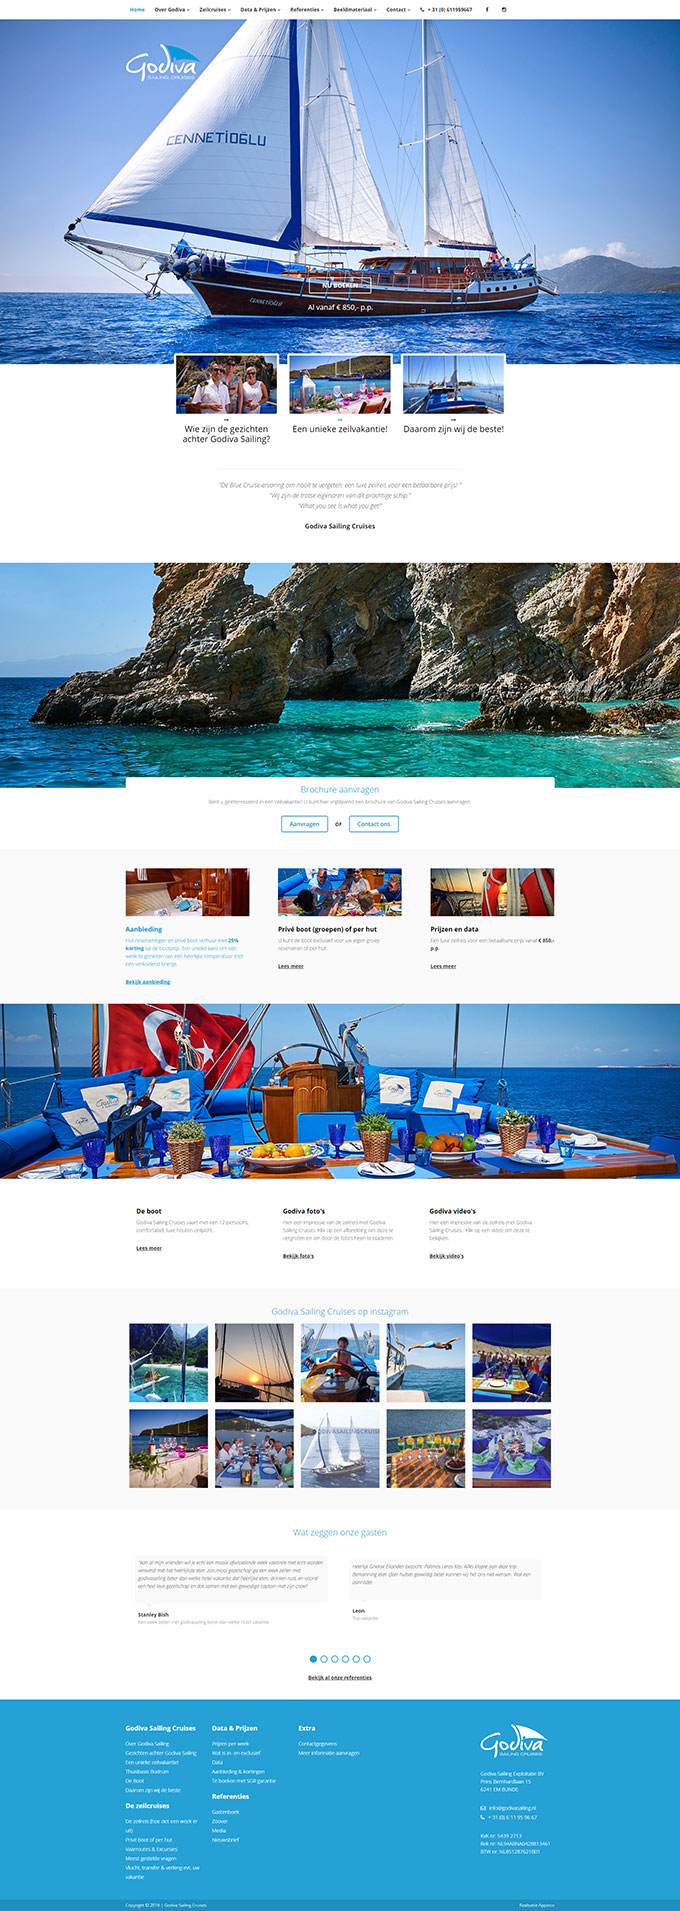 Appinco-Godiva-Sailing-Cruises